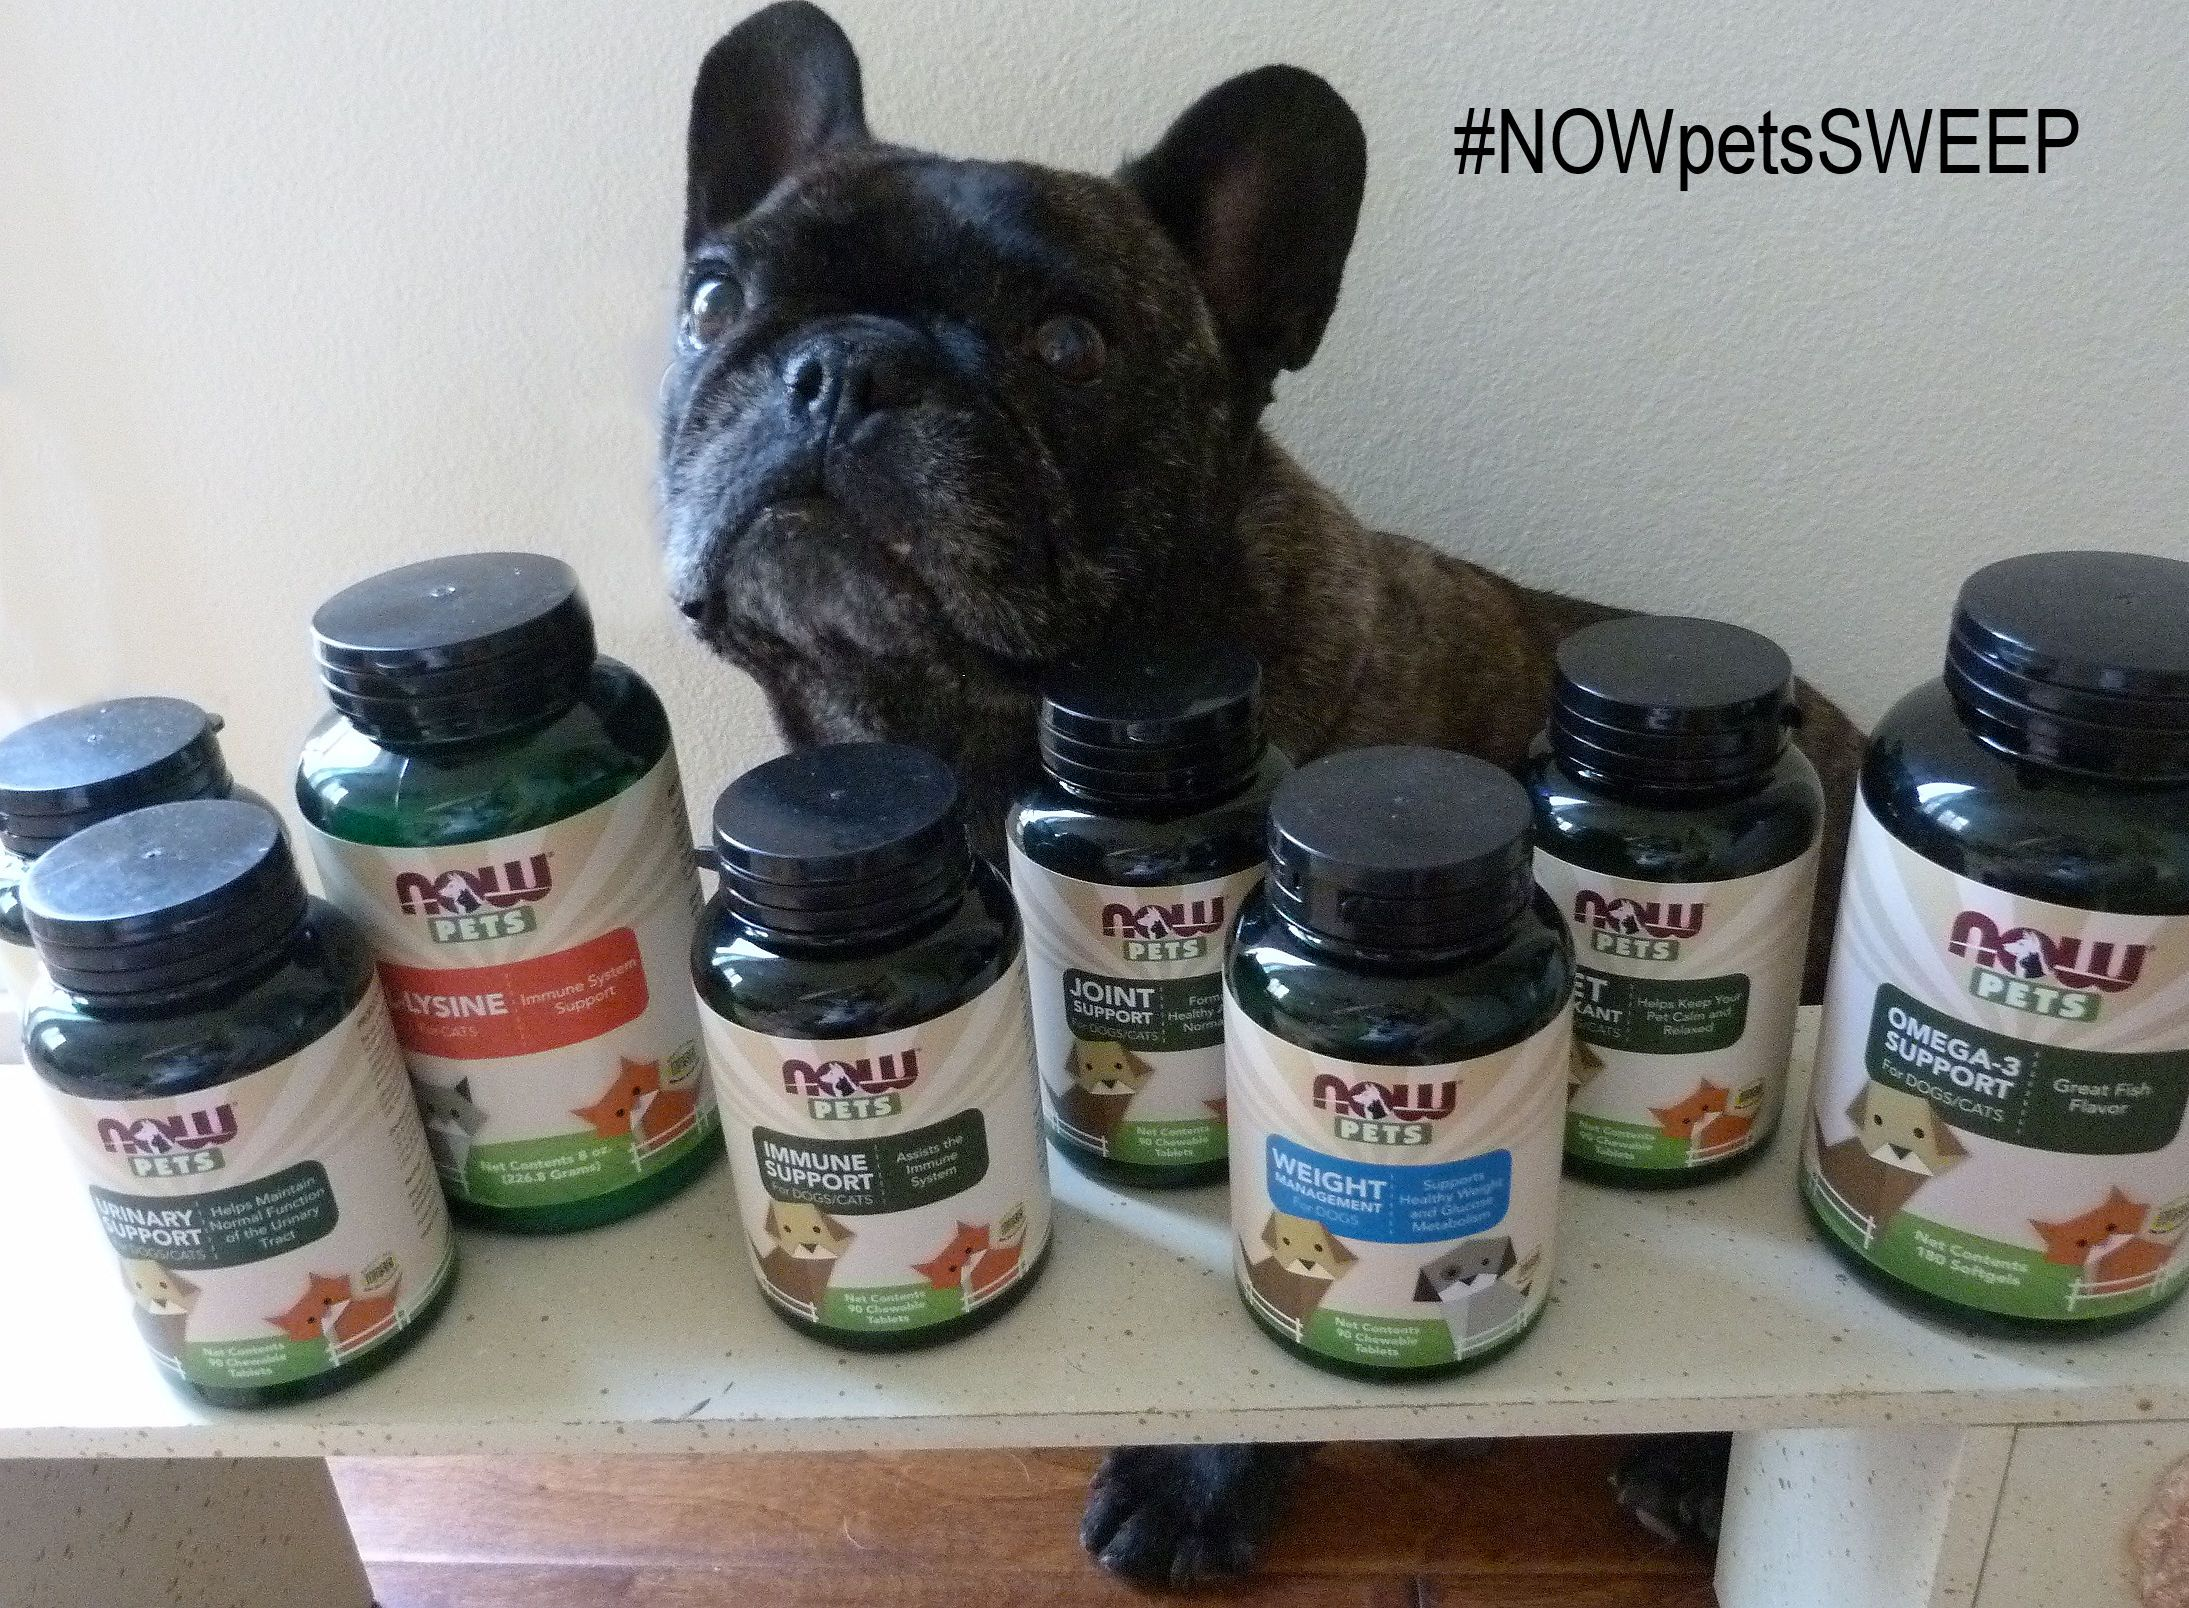 NOWpetsSweeps Pet supplements, Pets